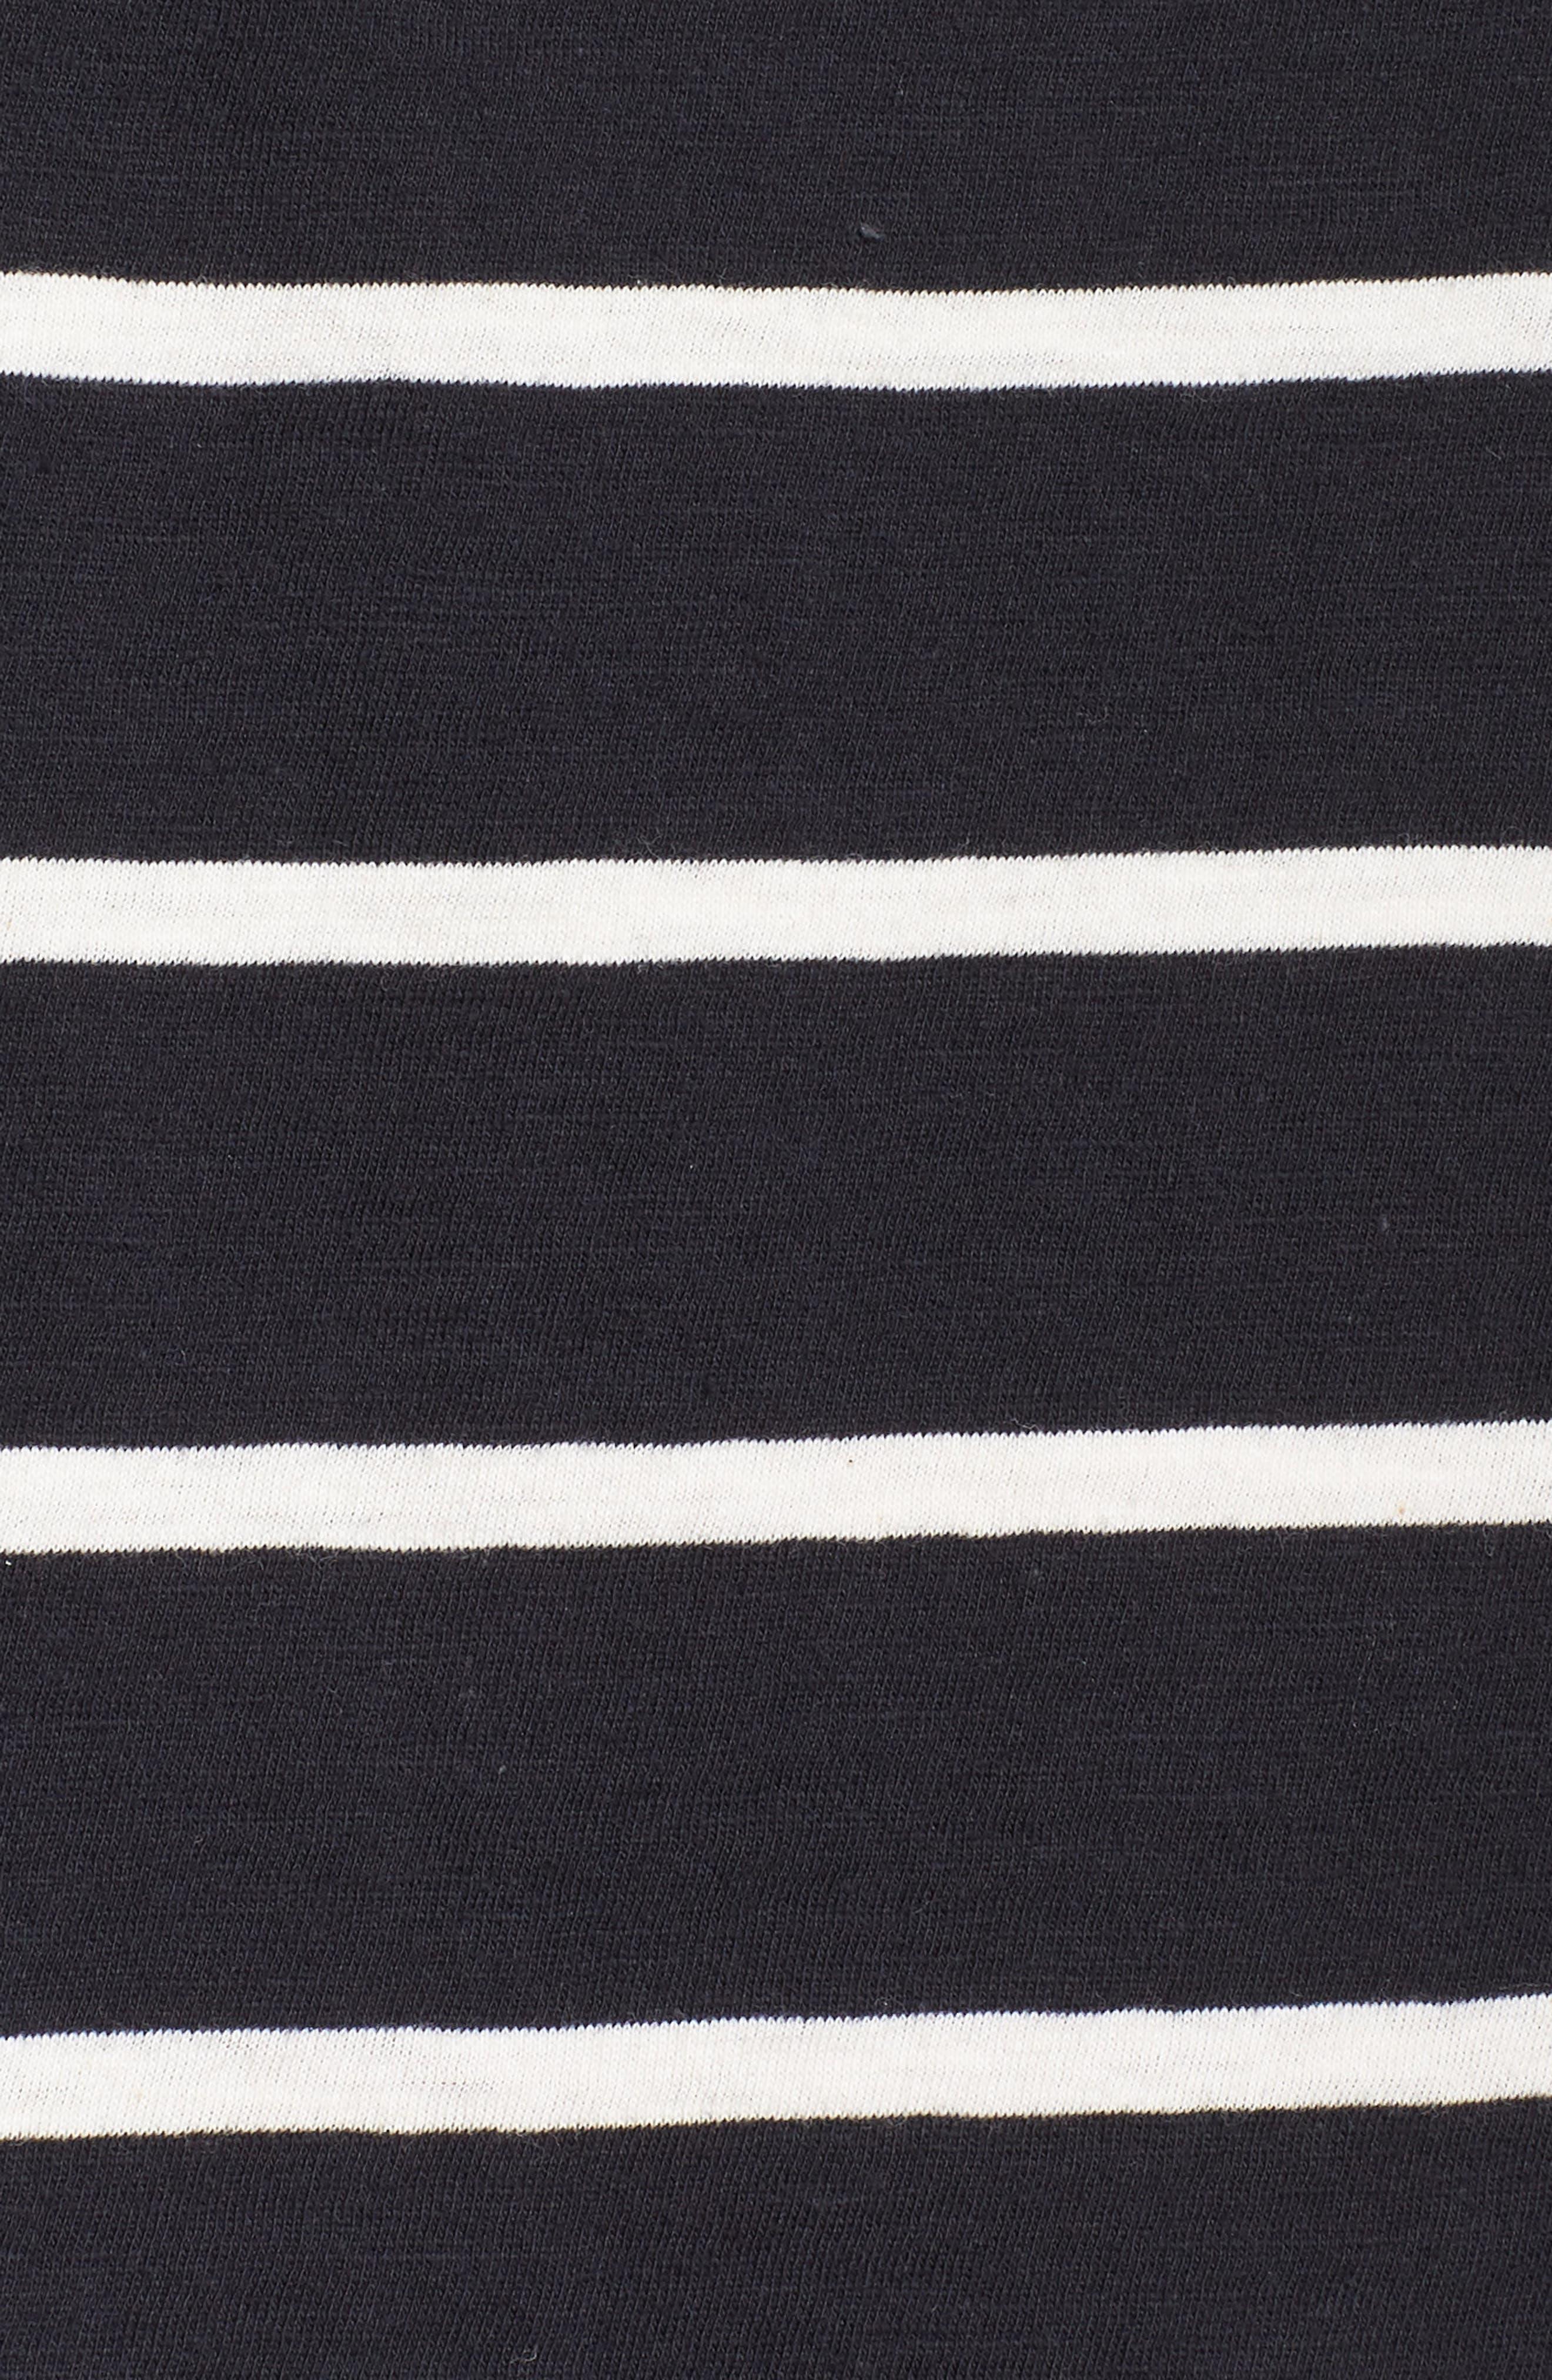 Stripe Organic Cotton Top,                             Alternate thumbnail 6, color,                             Black/ White